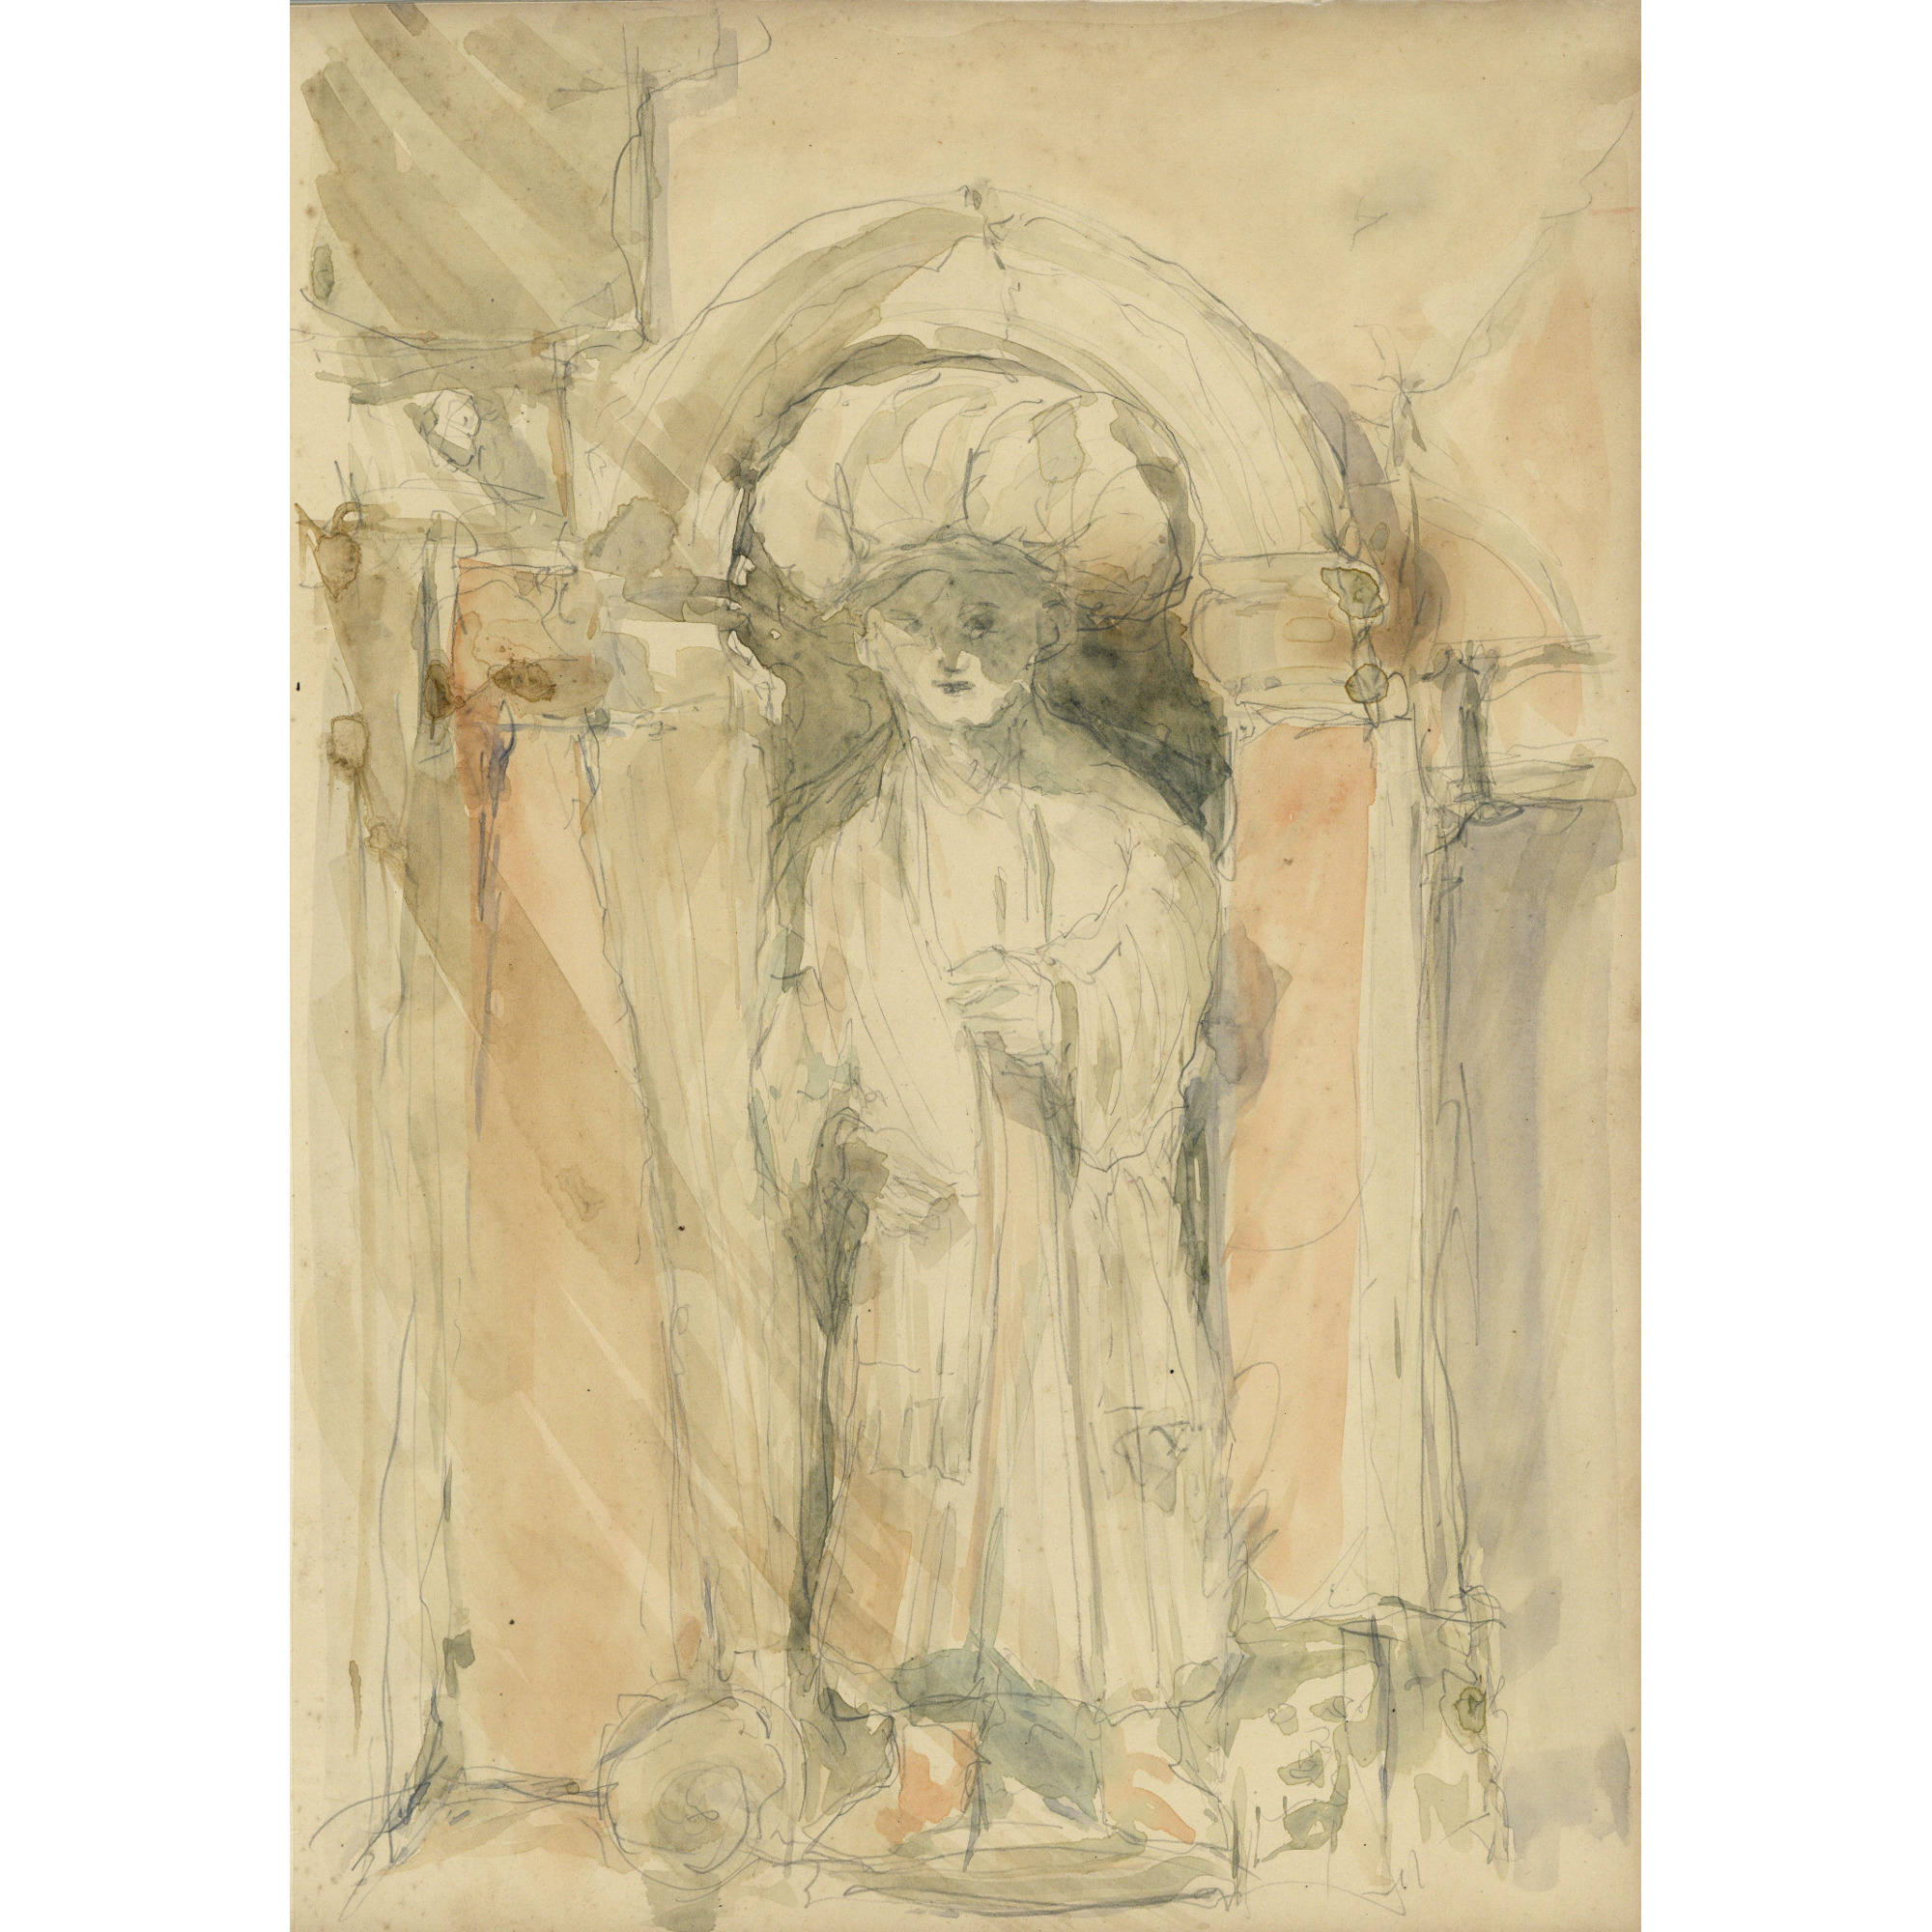 Pre-Raphaelite School drawing Sculpture of a Figure in a Niche, Venice, Italy